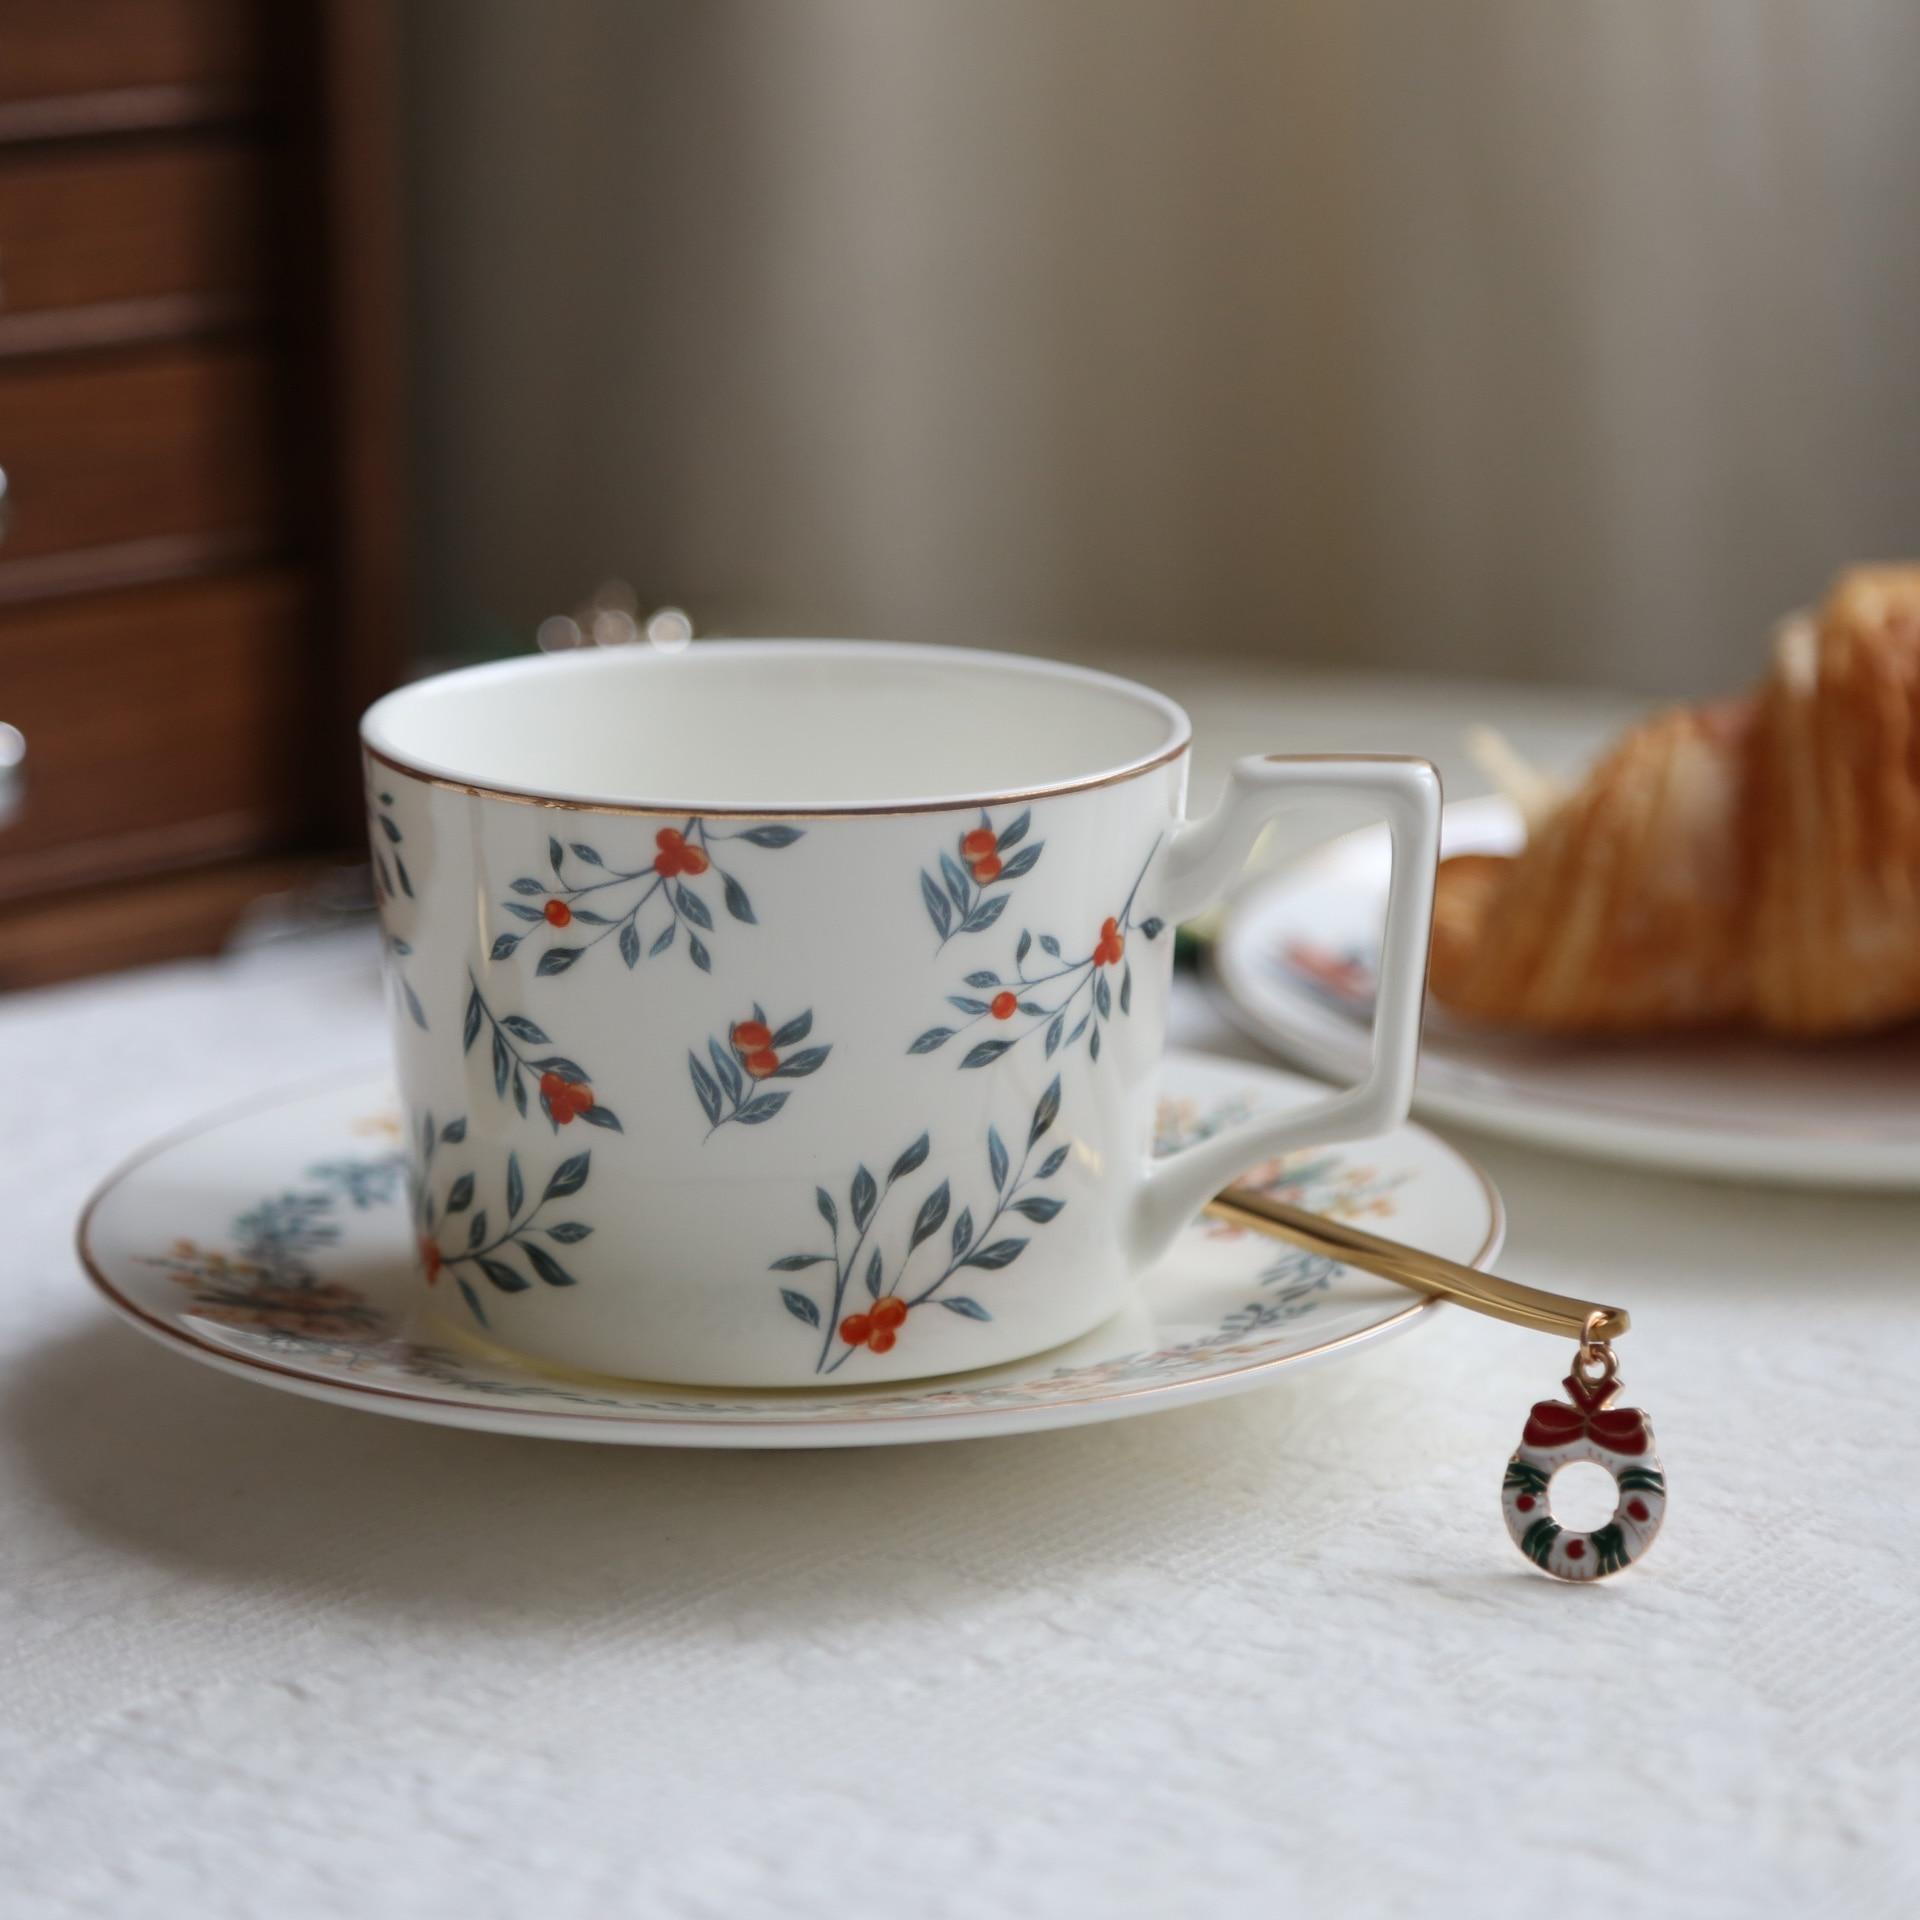 Korean Coffee Cup And Saucer Set Bone China Black Tea Dessert Cup Set Sugar Reusable Porcelain Koffie Kopjes Drinkware ED50BD